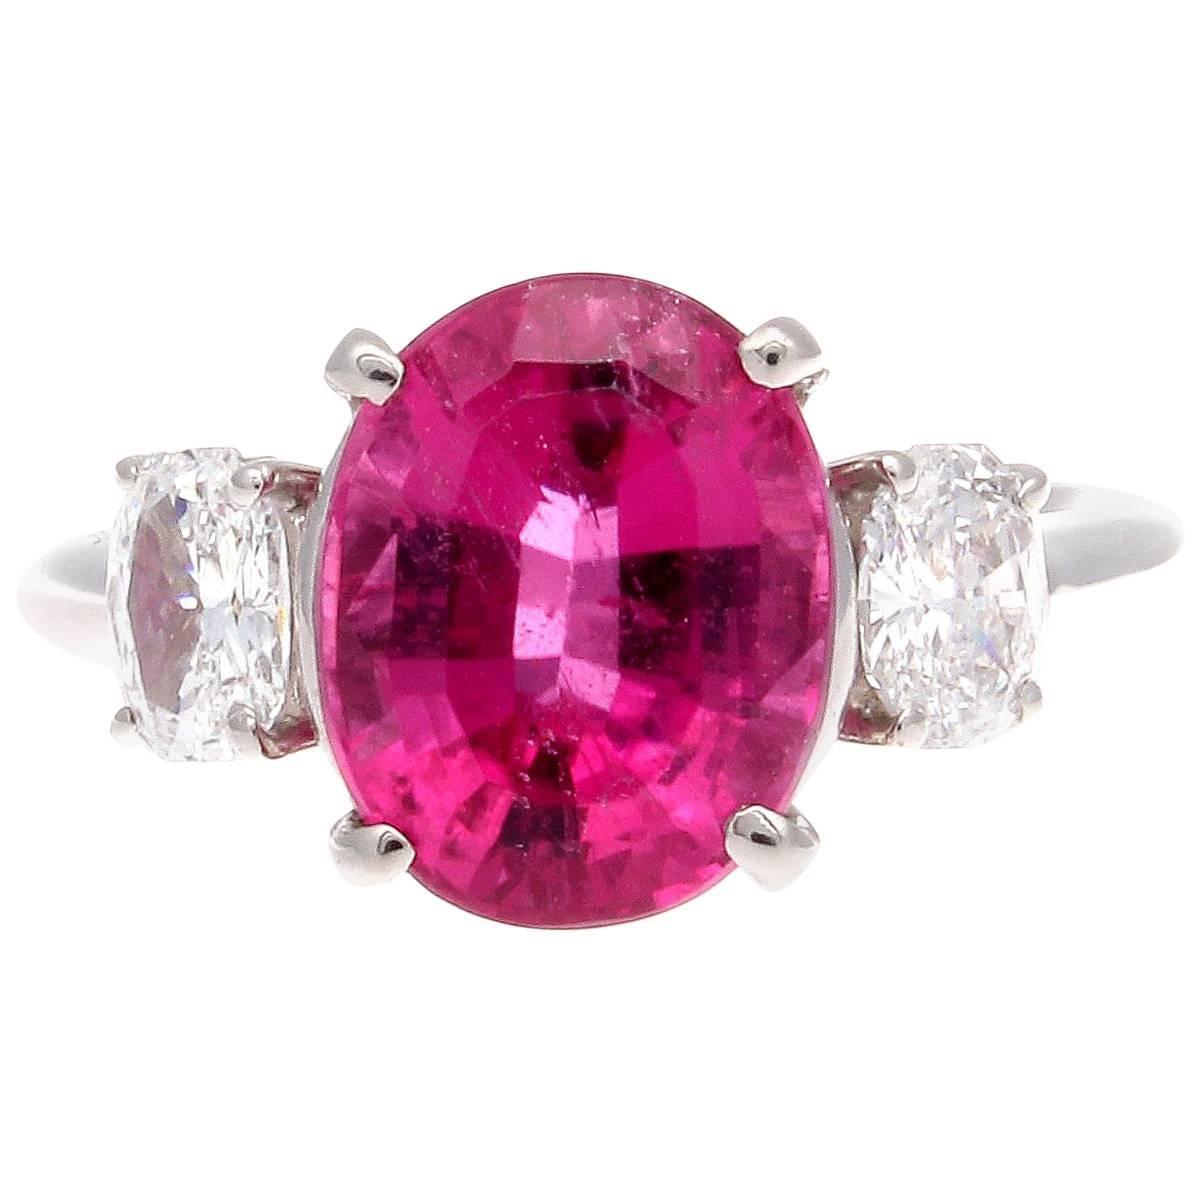 Vibrant Pink Tourmaline Diamond Platinum Ring For Sale at 1stdibs